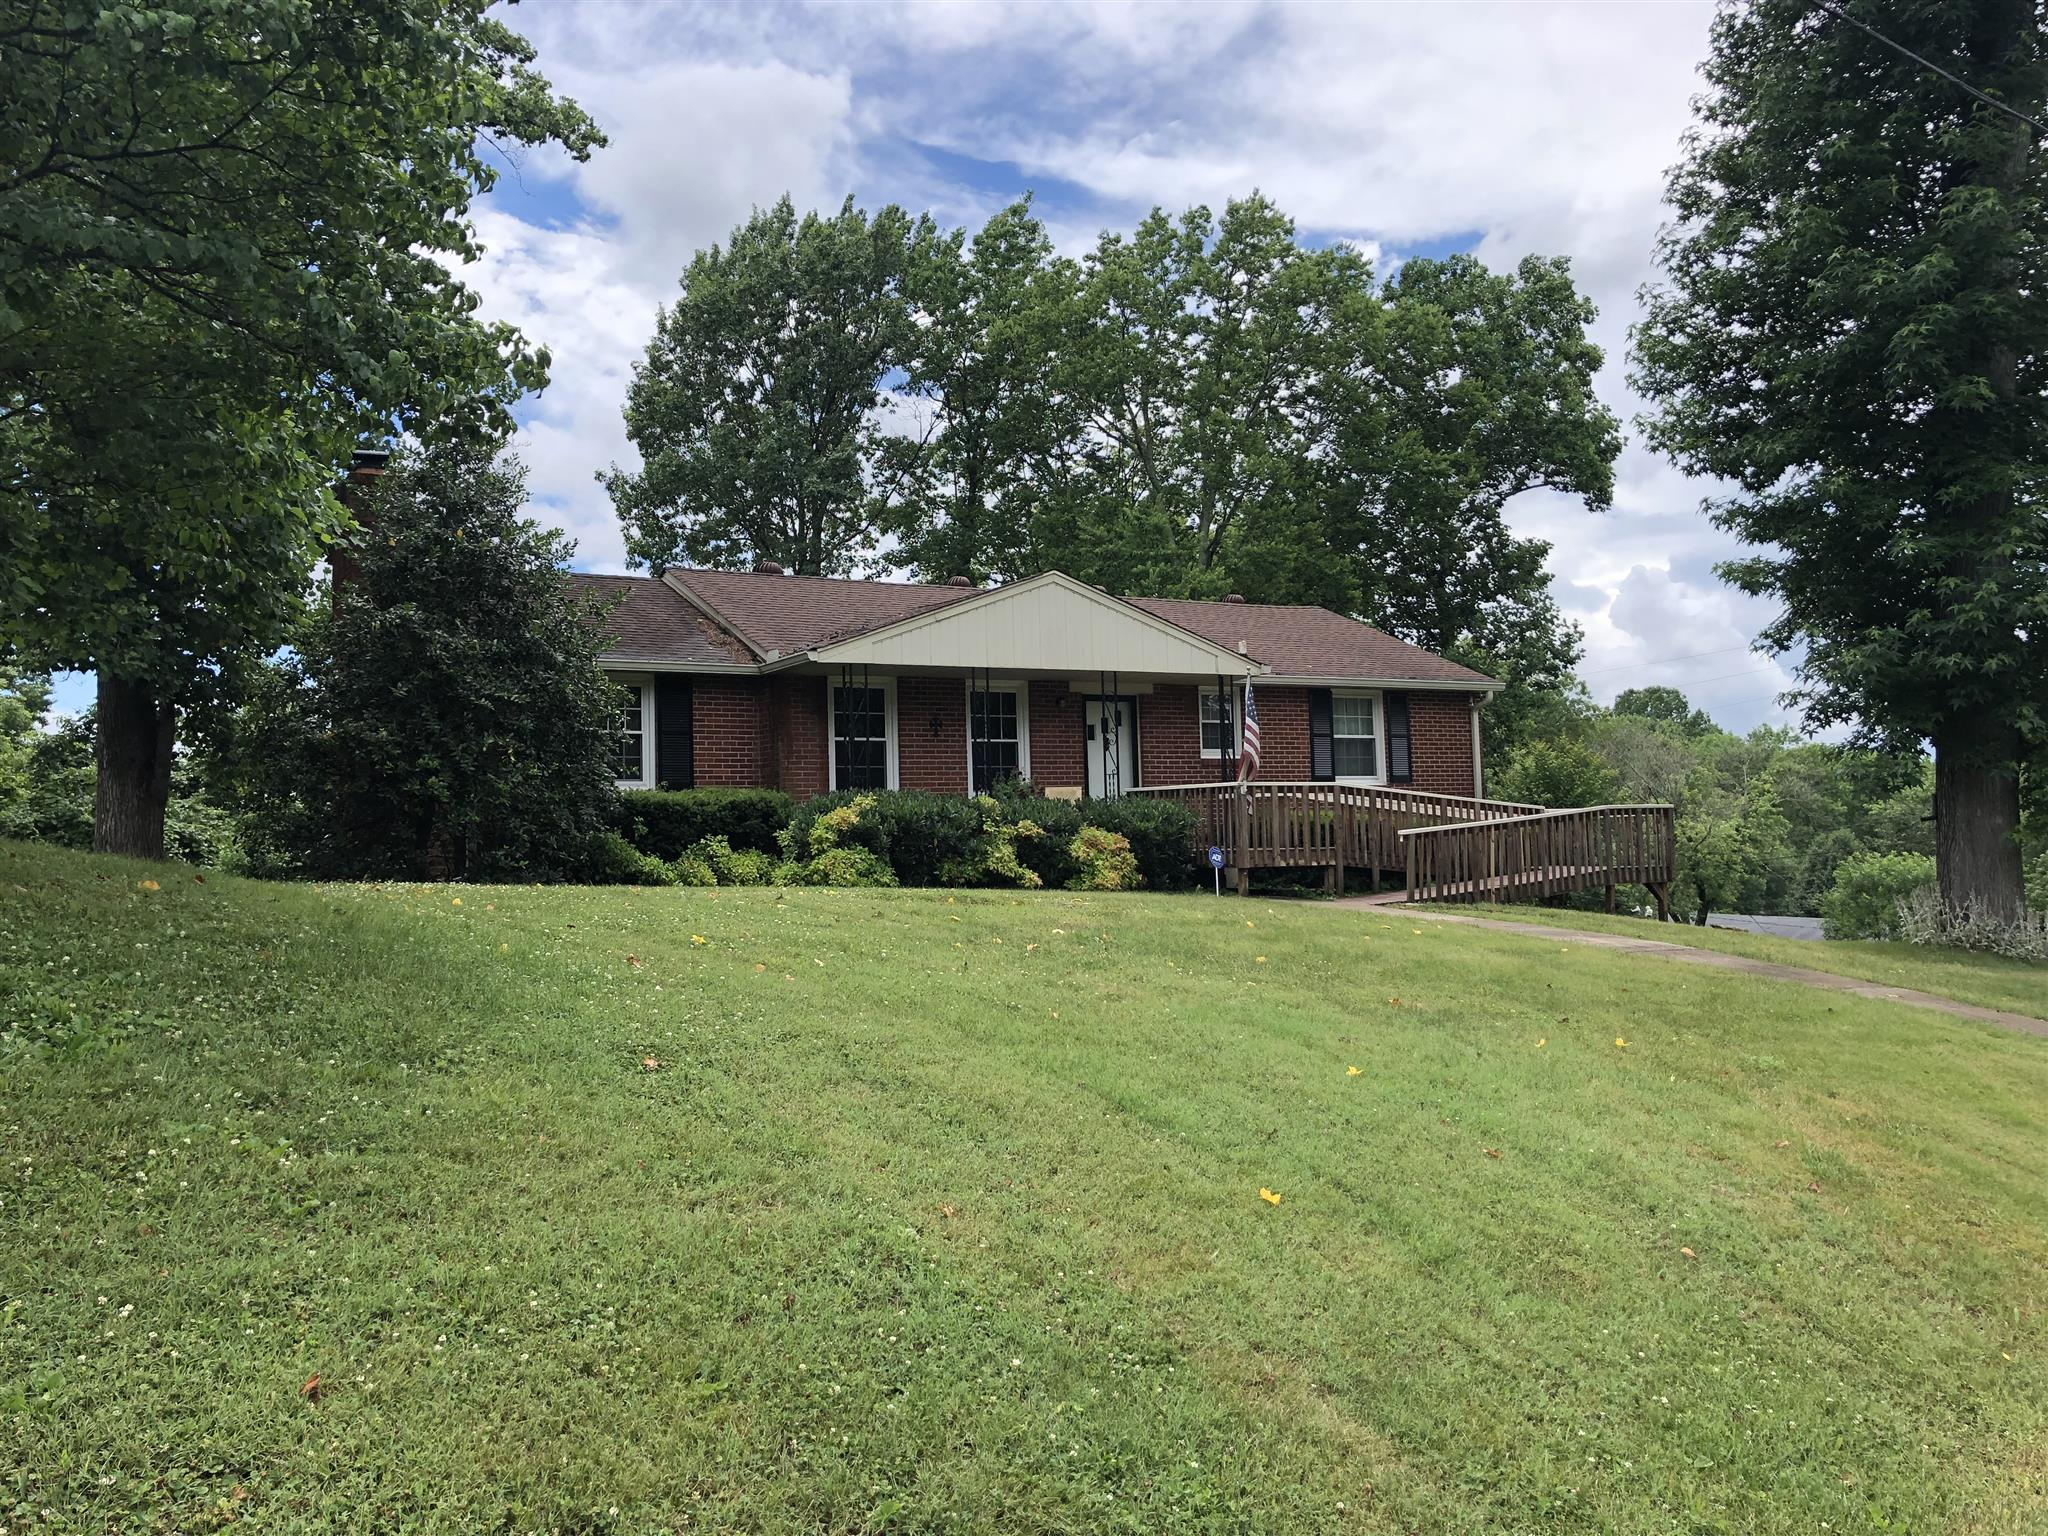 212 Myrick Dr, Nashville, TN 37214 - Nashville, TN real estate listing